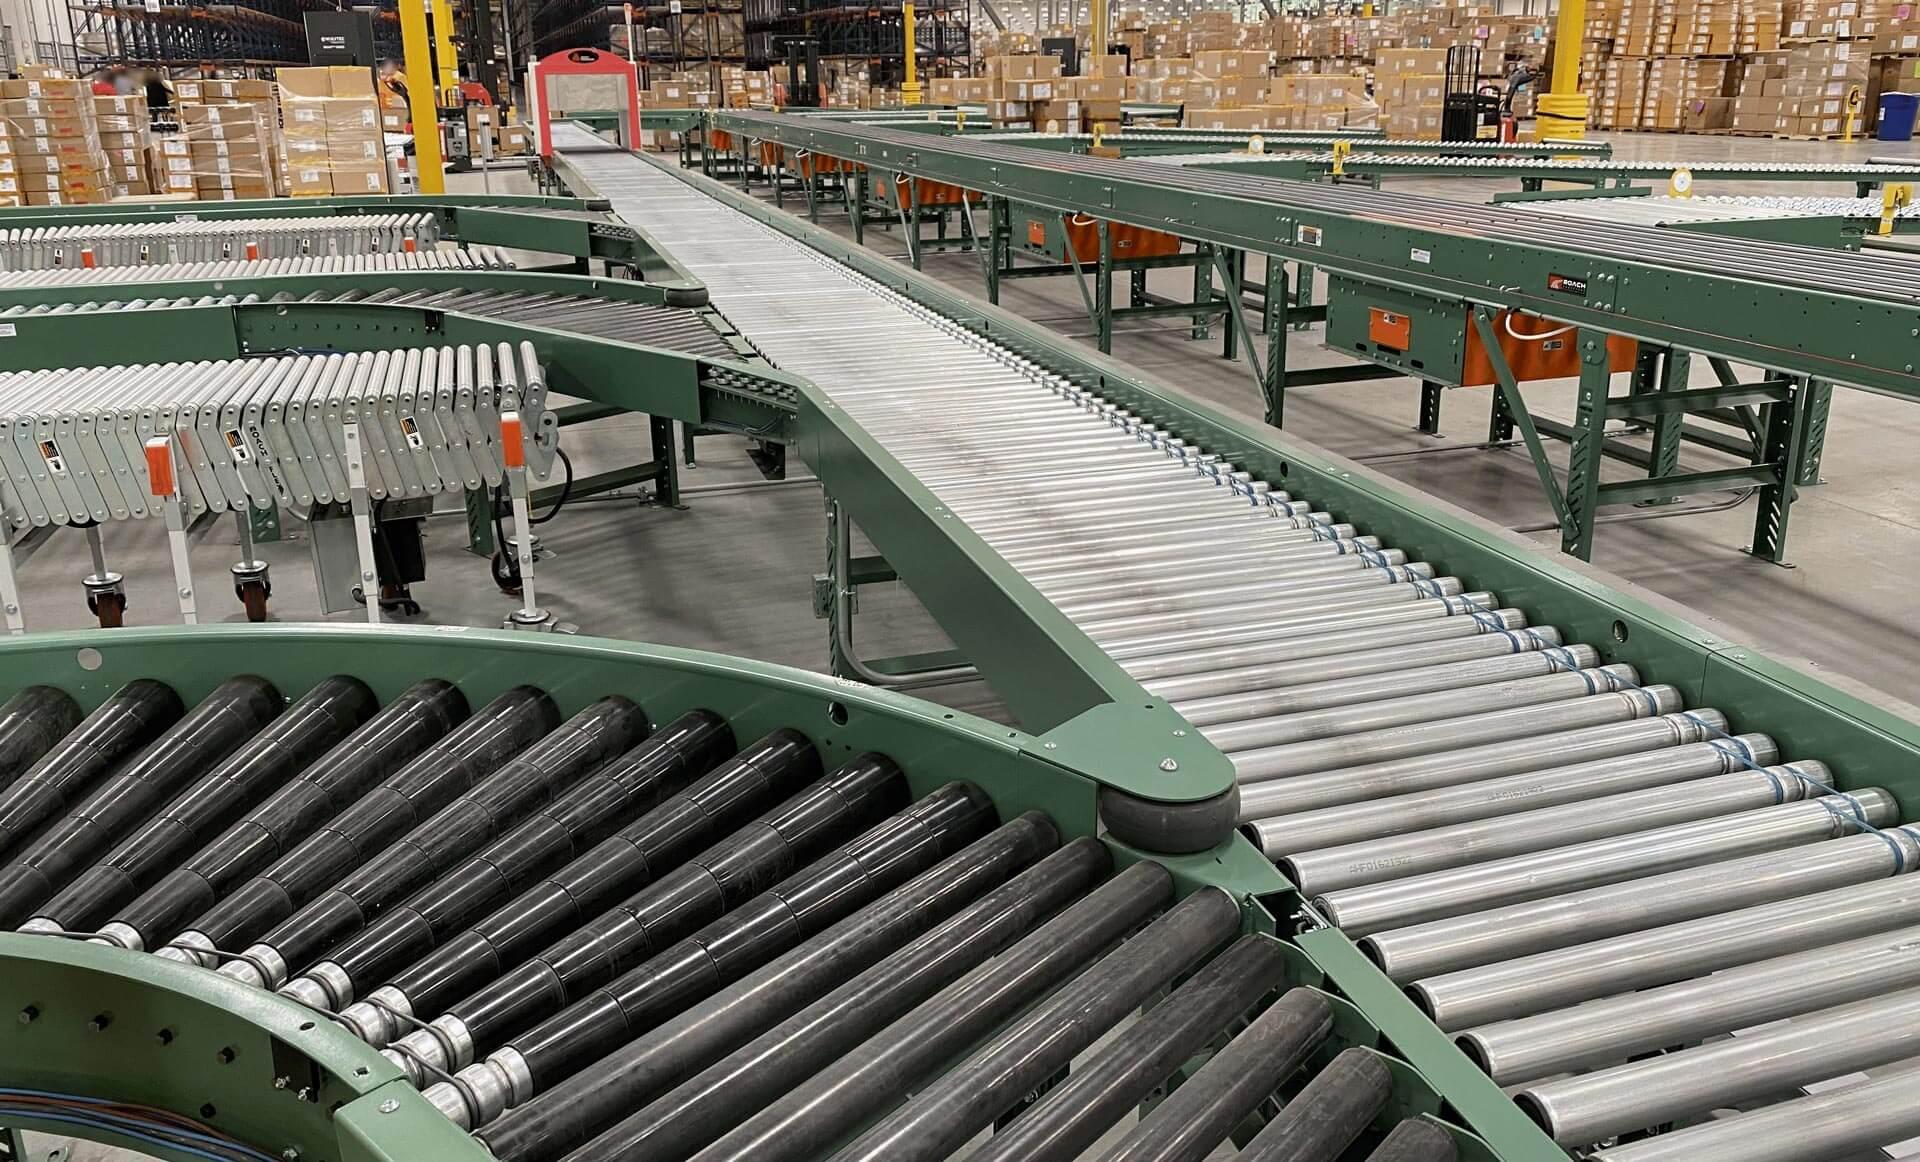 Conveyor System in Warehouse